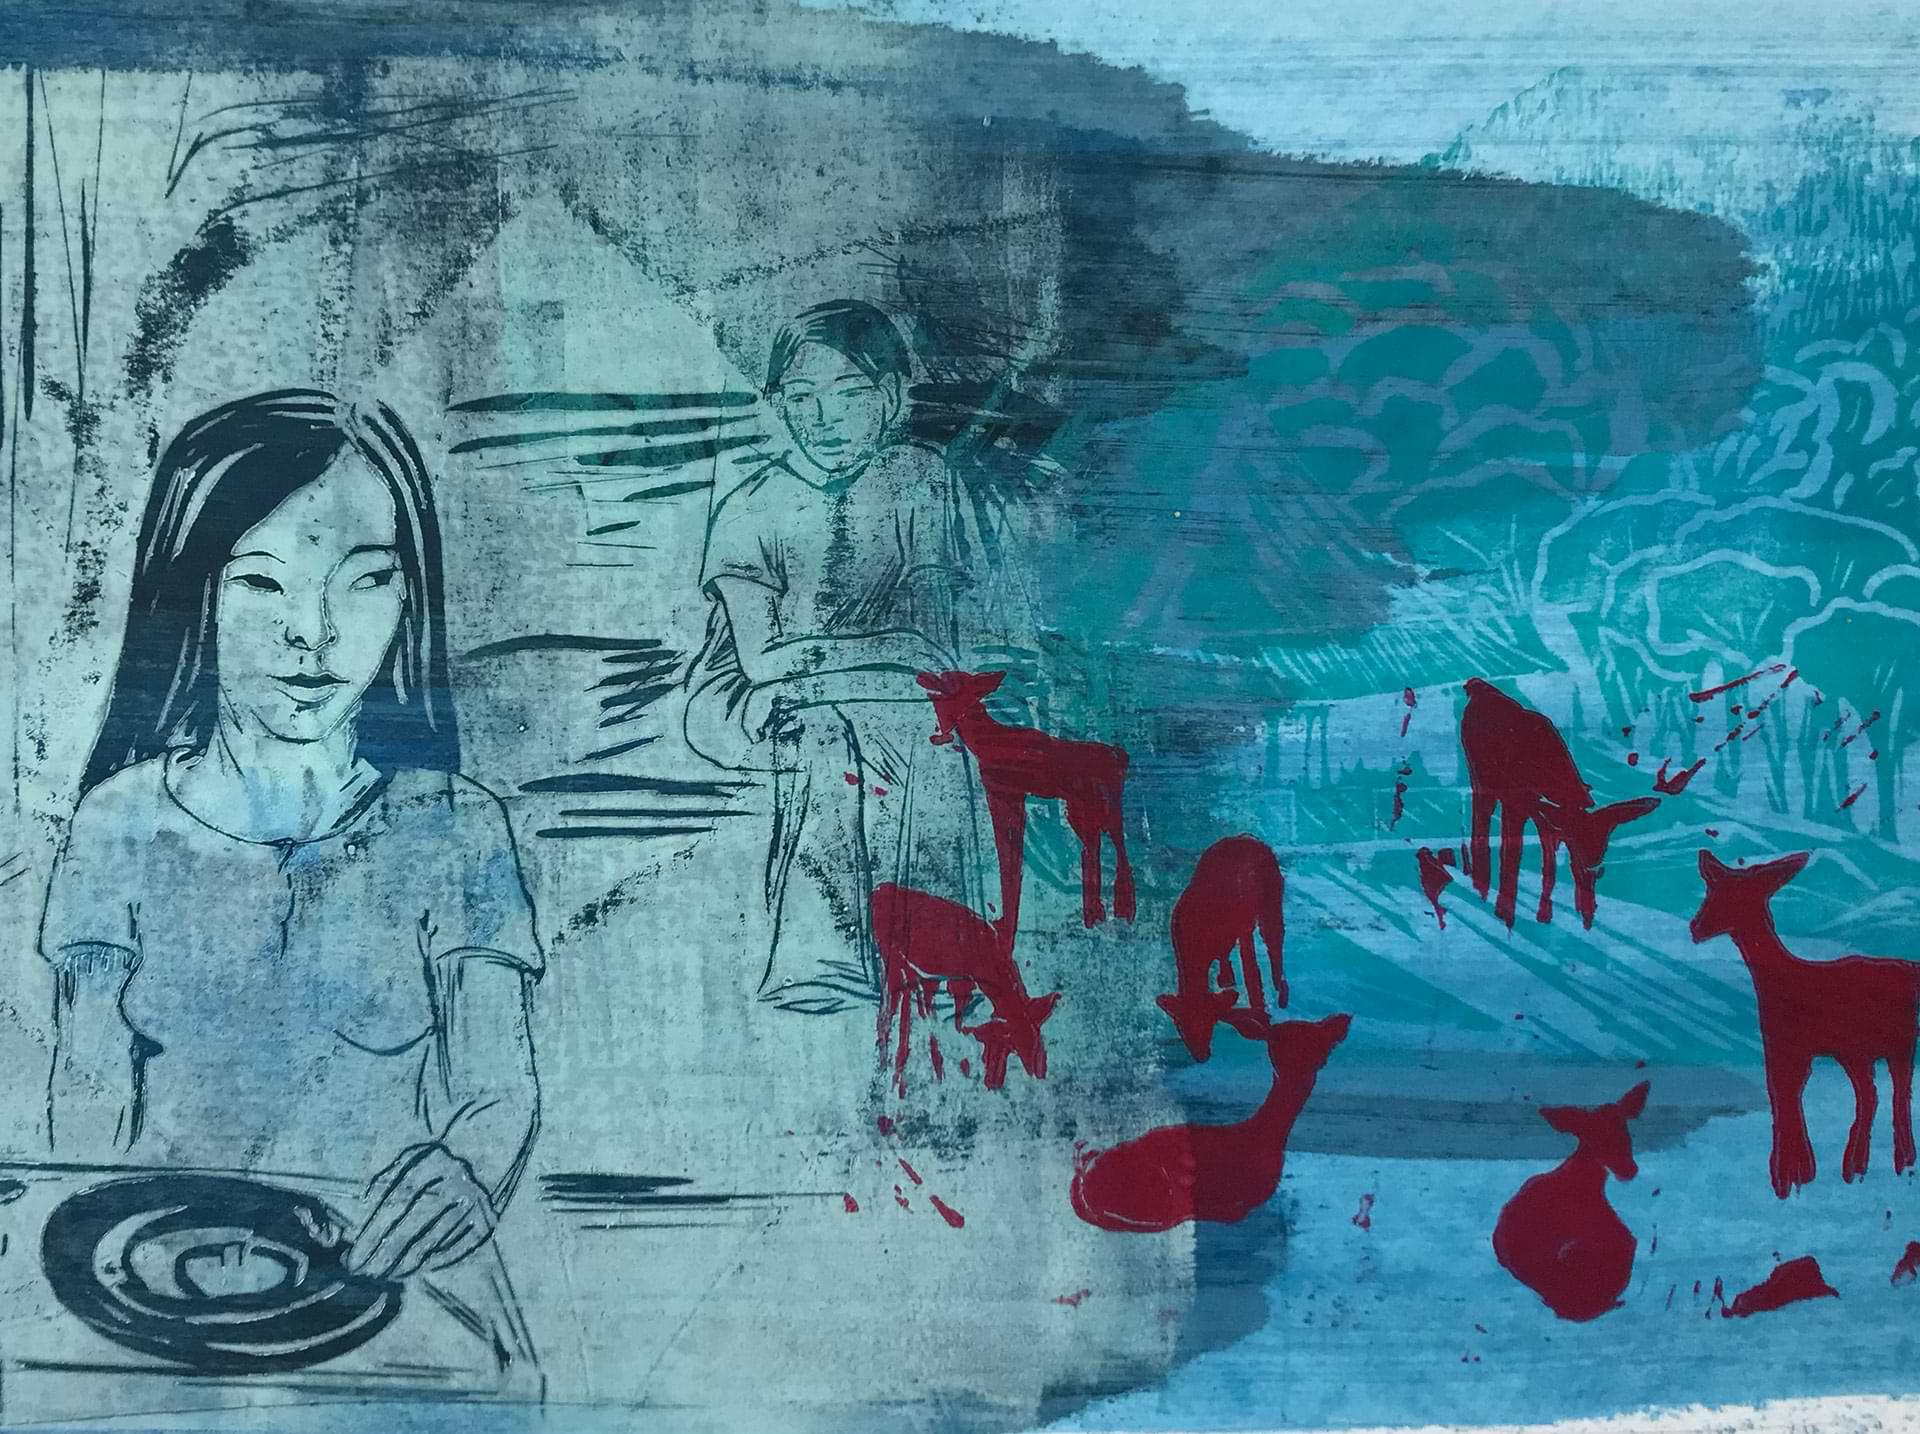 christianehaag-theboywholefthome-kunst-art-linoldruck-linocut-japan-harukimurakami